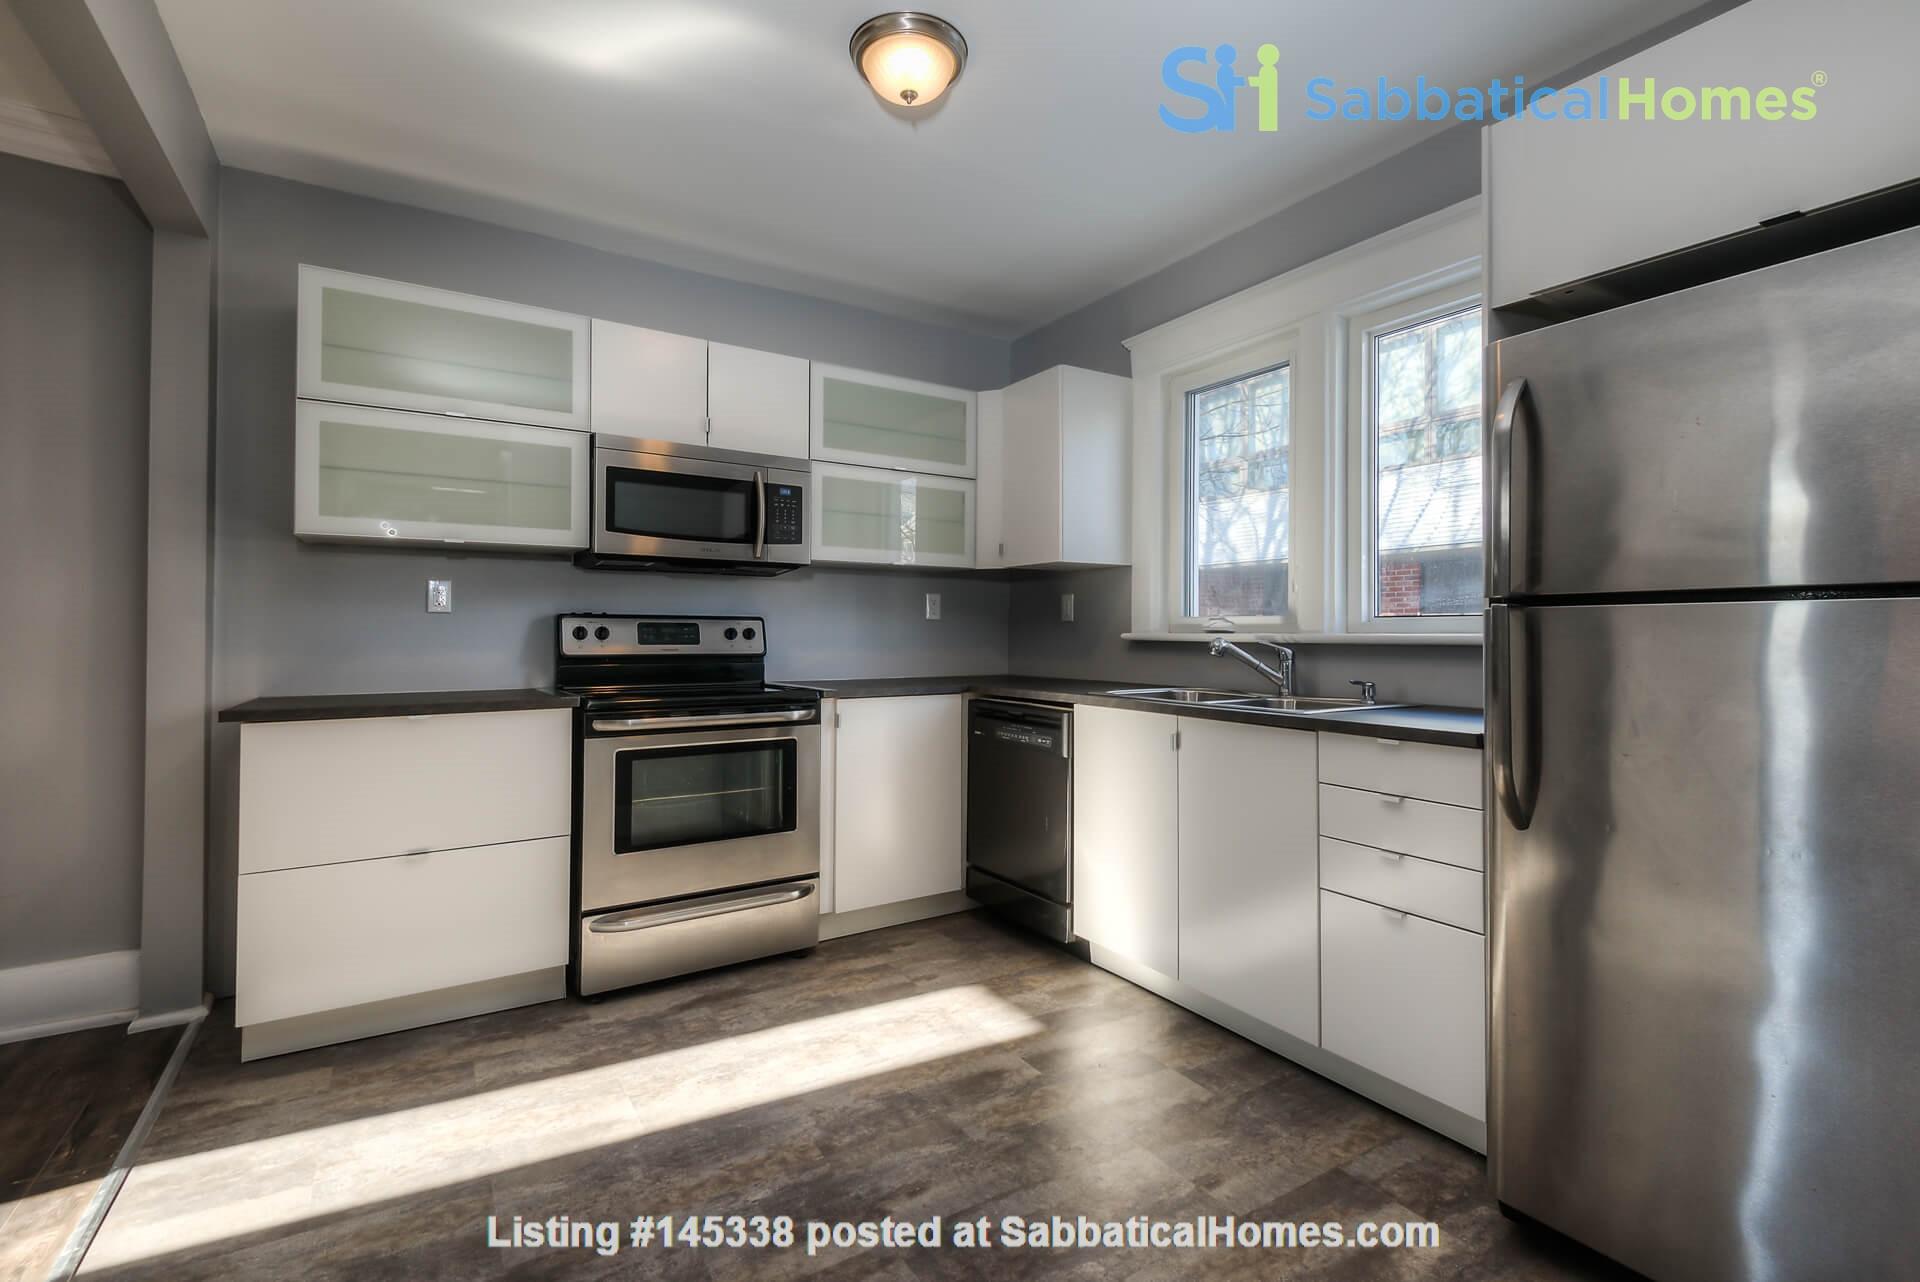 3 bdrm home (unfurnished) - downtown Kitchener-Waterloo Home Rental in Kitchener, Ontario, Canada 1